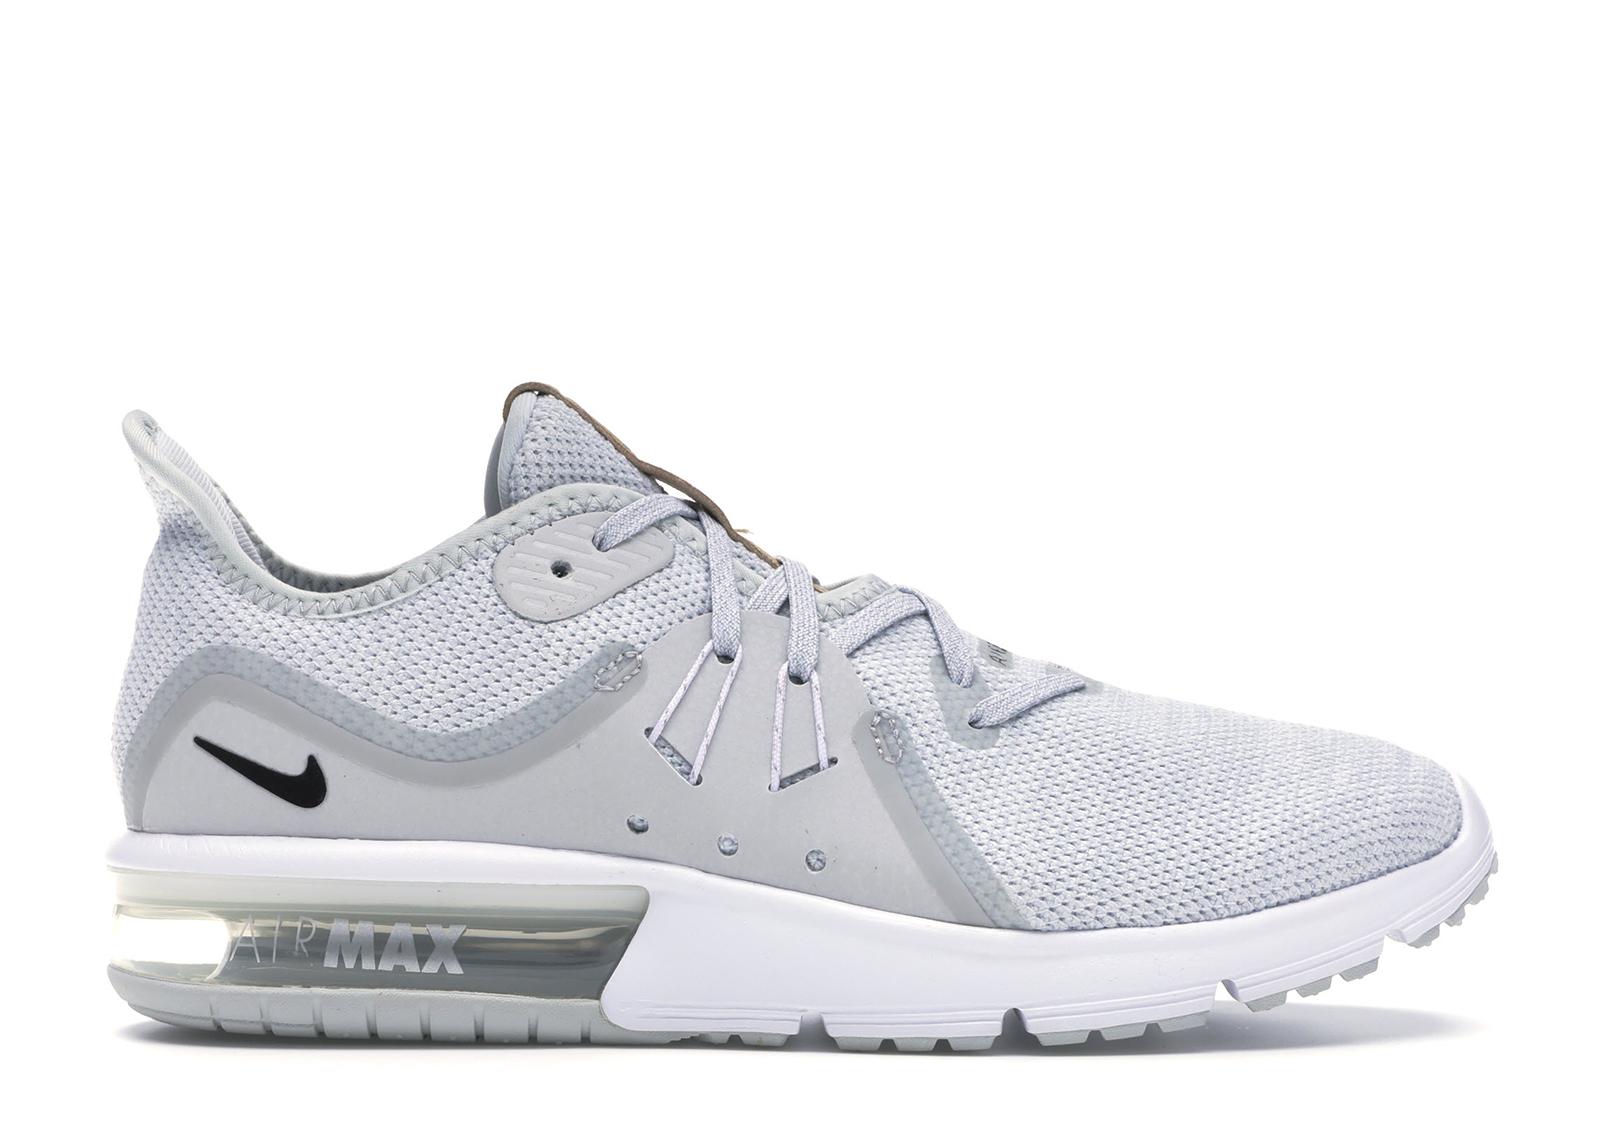 Nike Air Max Sequent 3 Pure Platinum Black-White (W) - 908993-008